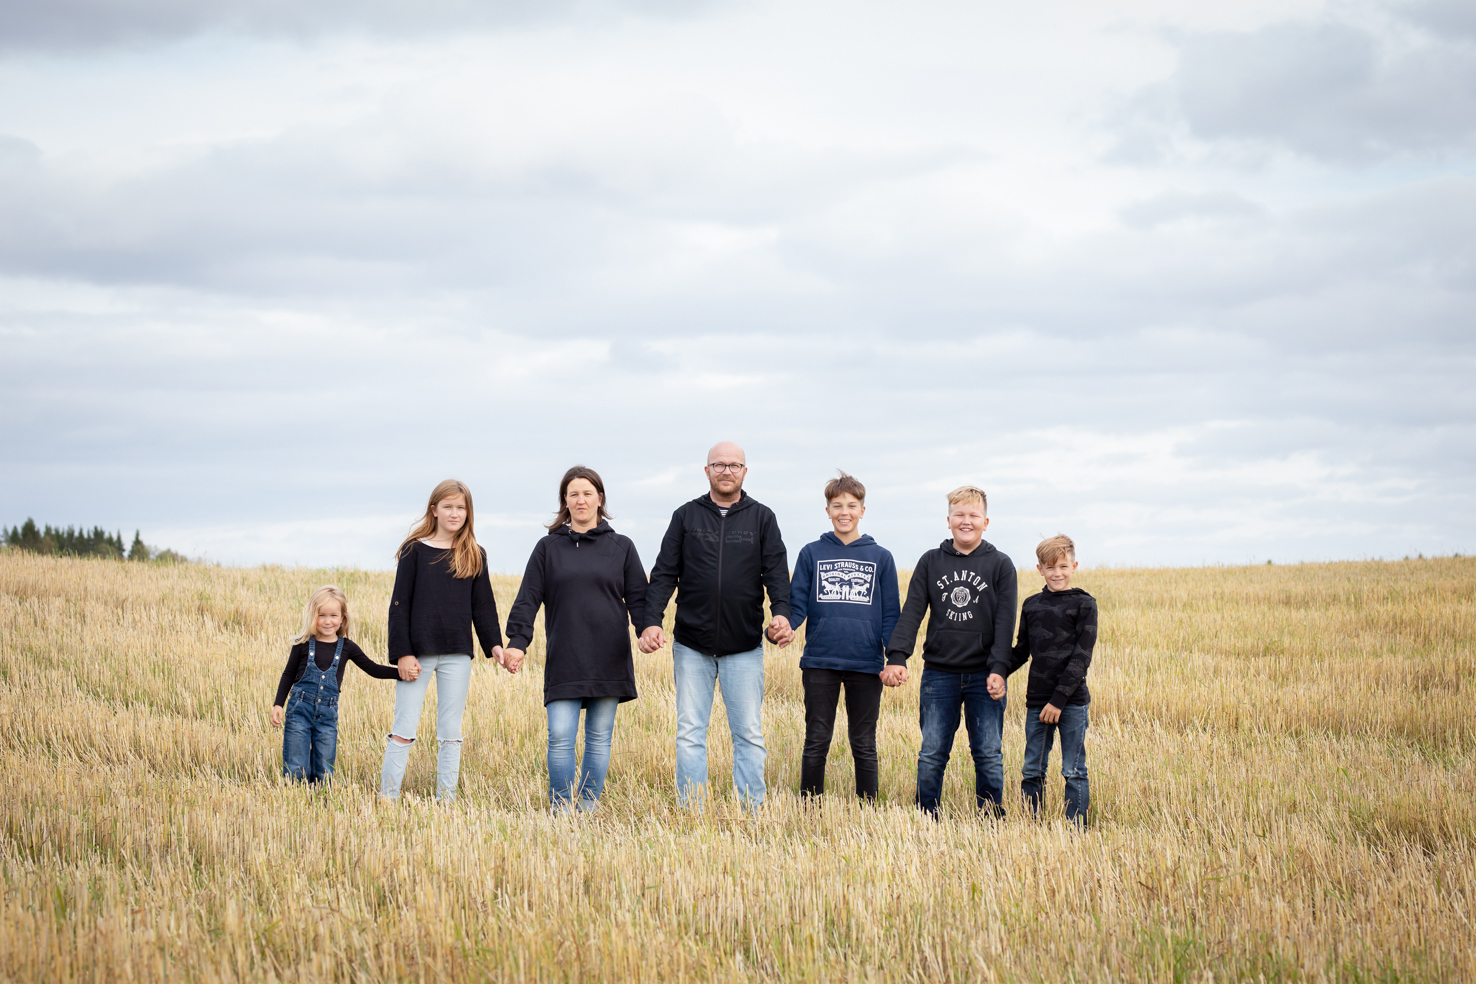 perhekuvaus viljapellolla